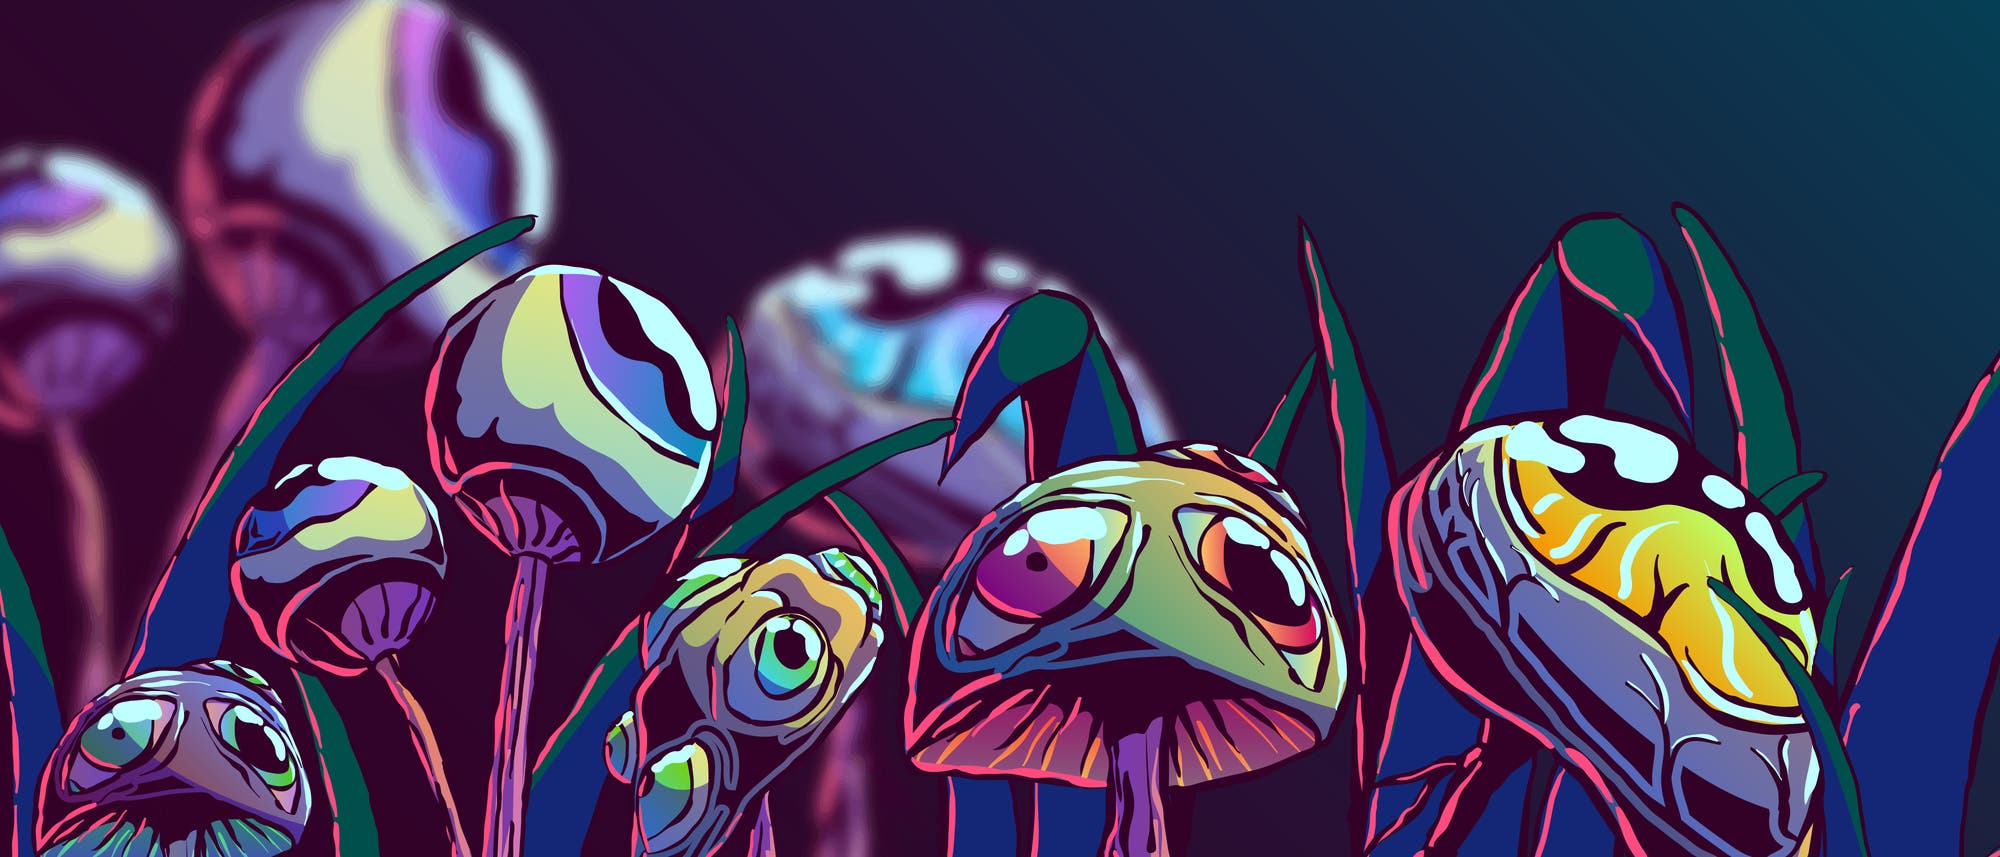 Pilze mit Augen